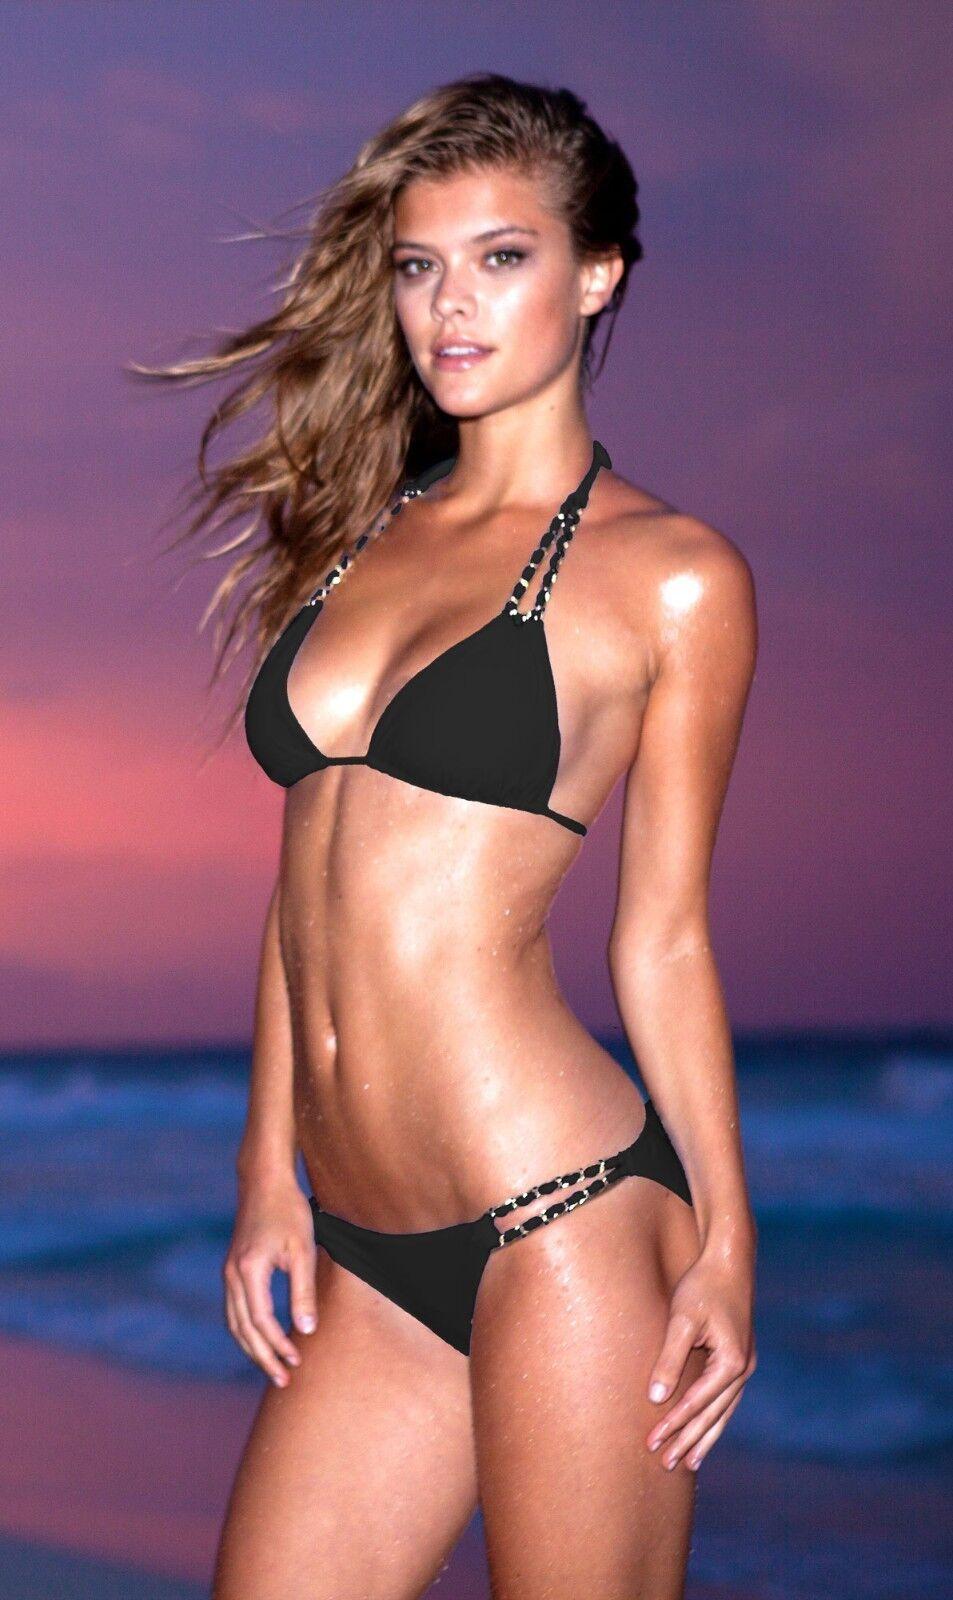 Brand New Sauvage Swimwear Bikini Vegas, Marbella, Ibiza, Miami